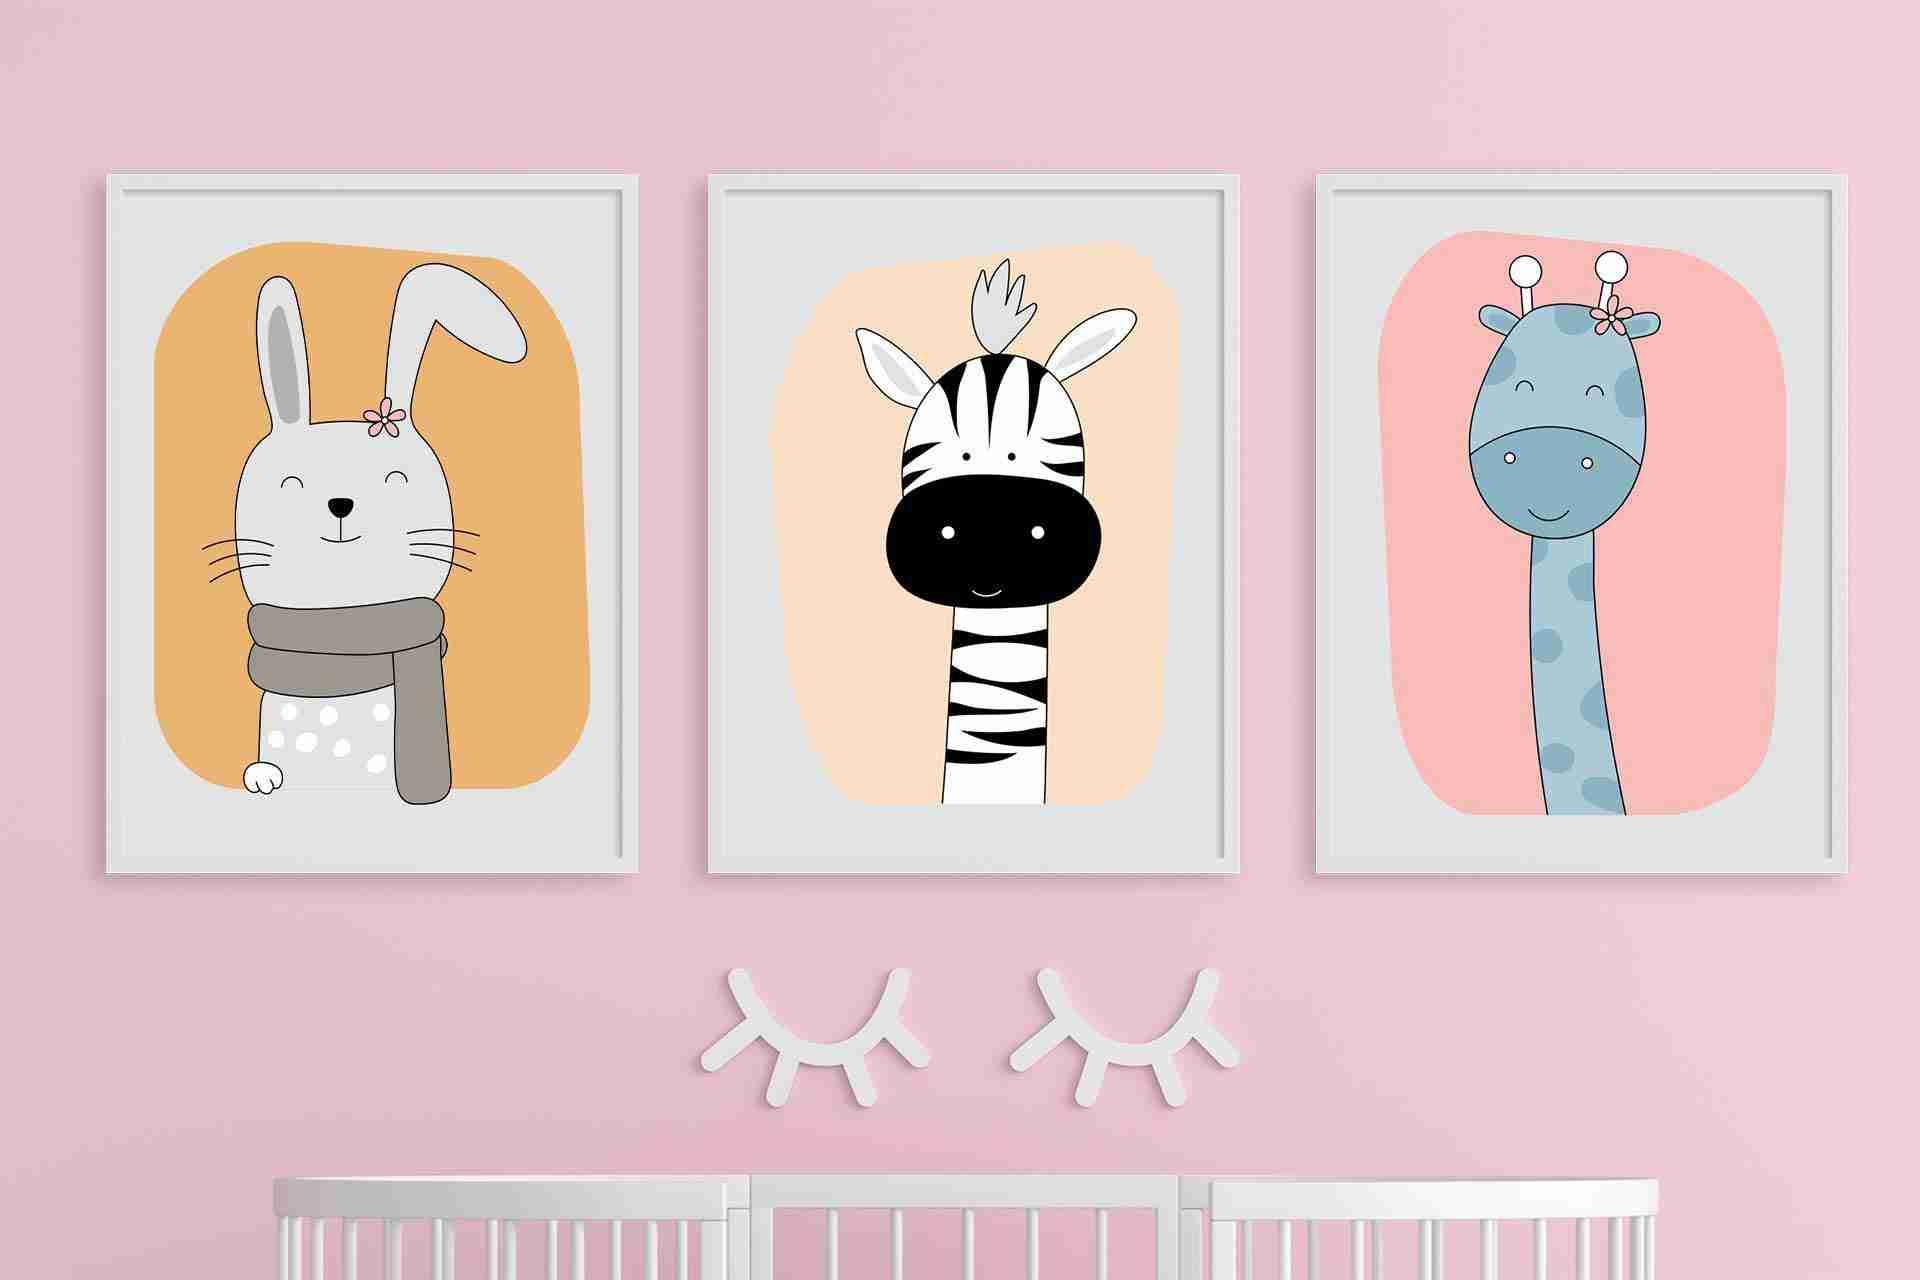 Cute-animal-framed-poster-prints-CU-4.jpg